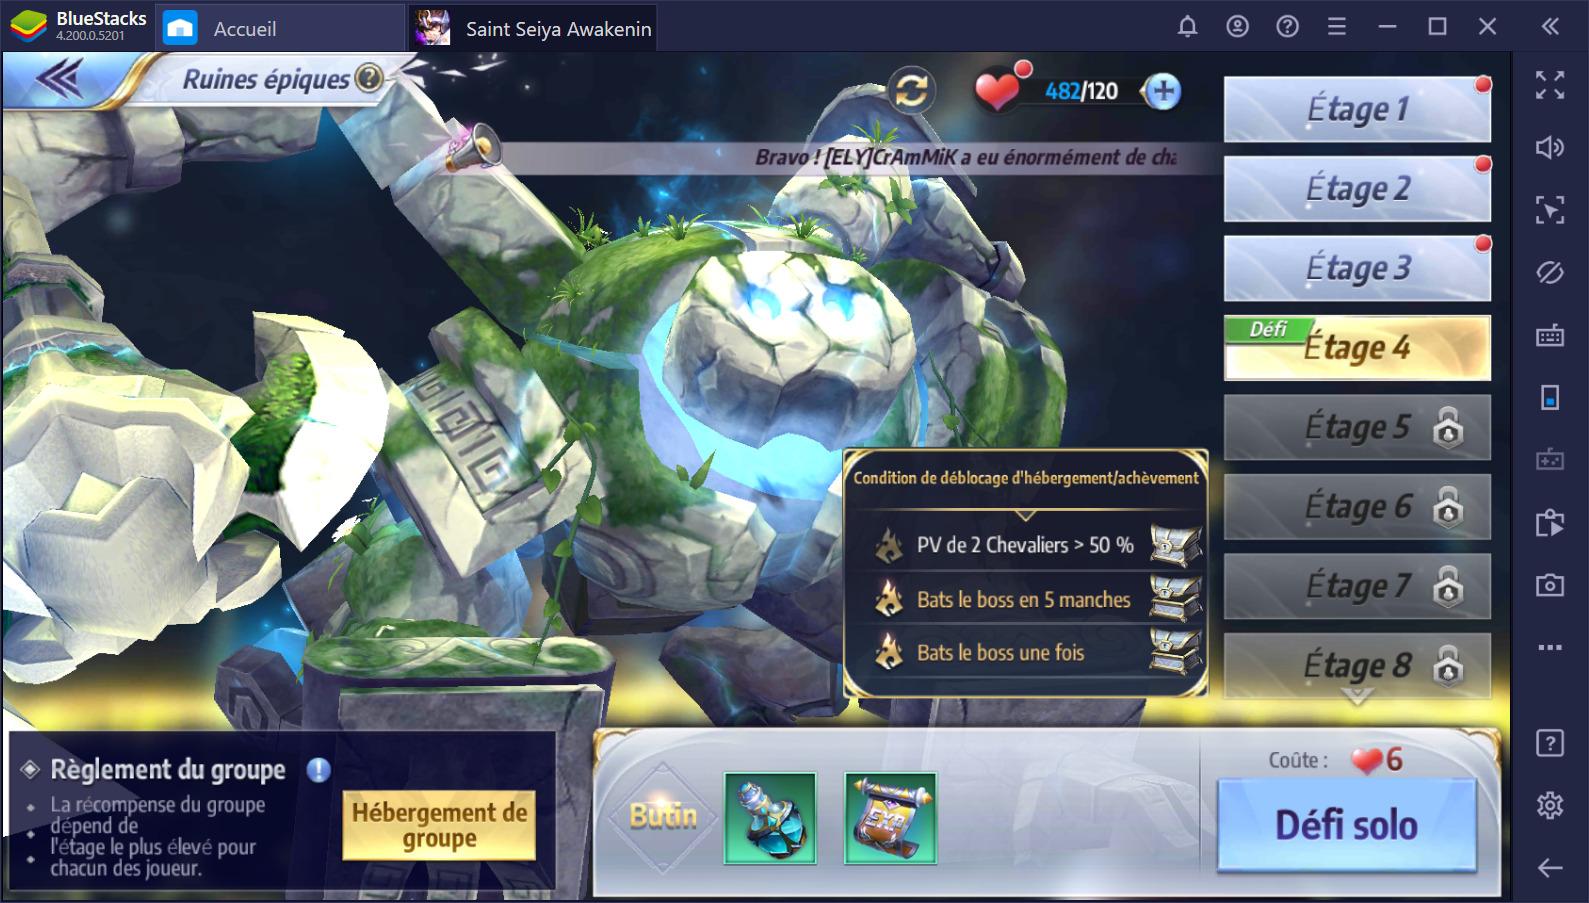 Guide sur le farming pour Saint Seiya Awakening